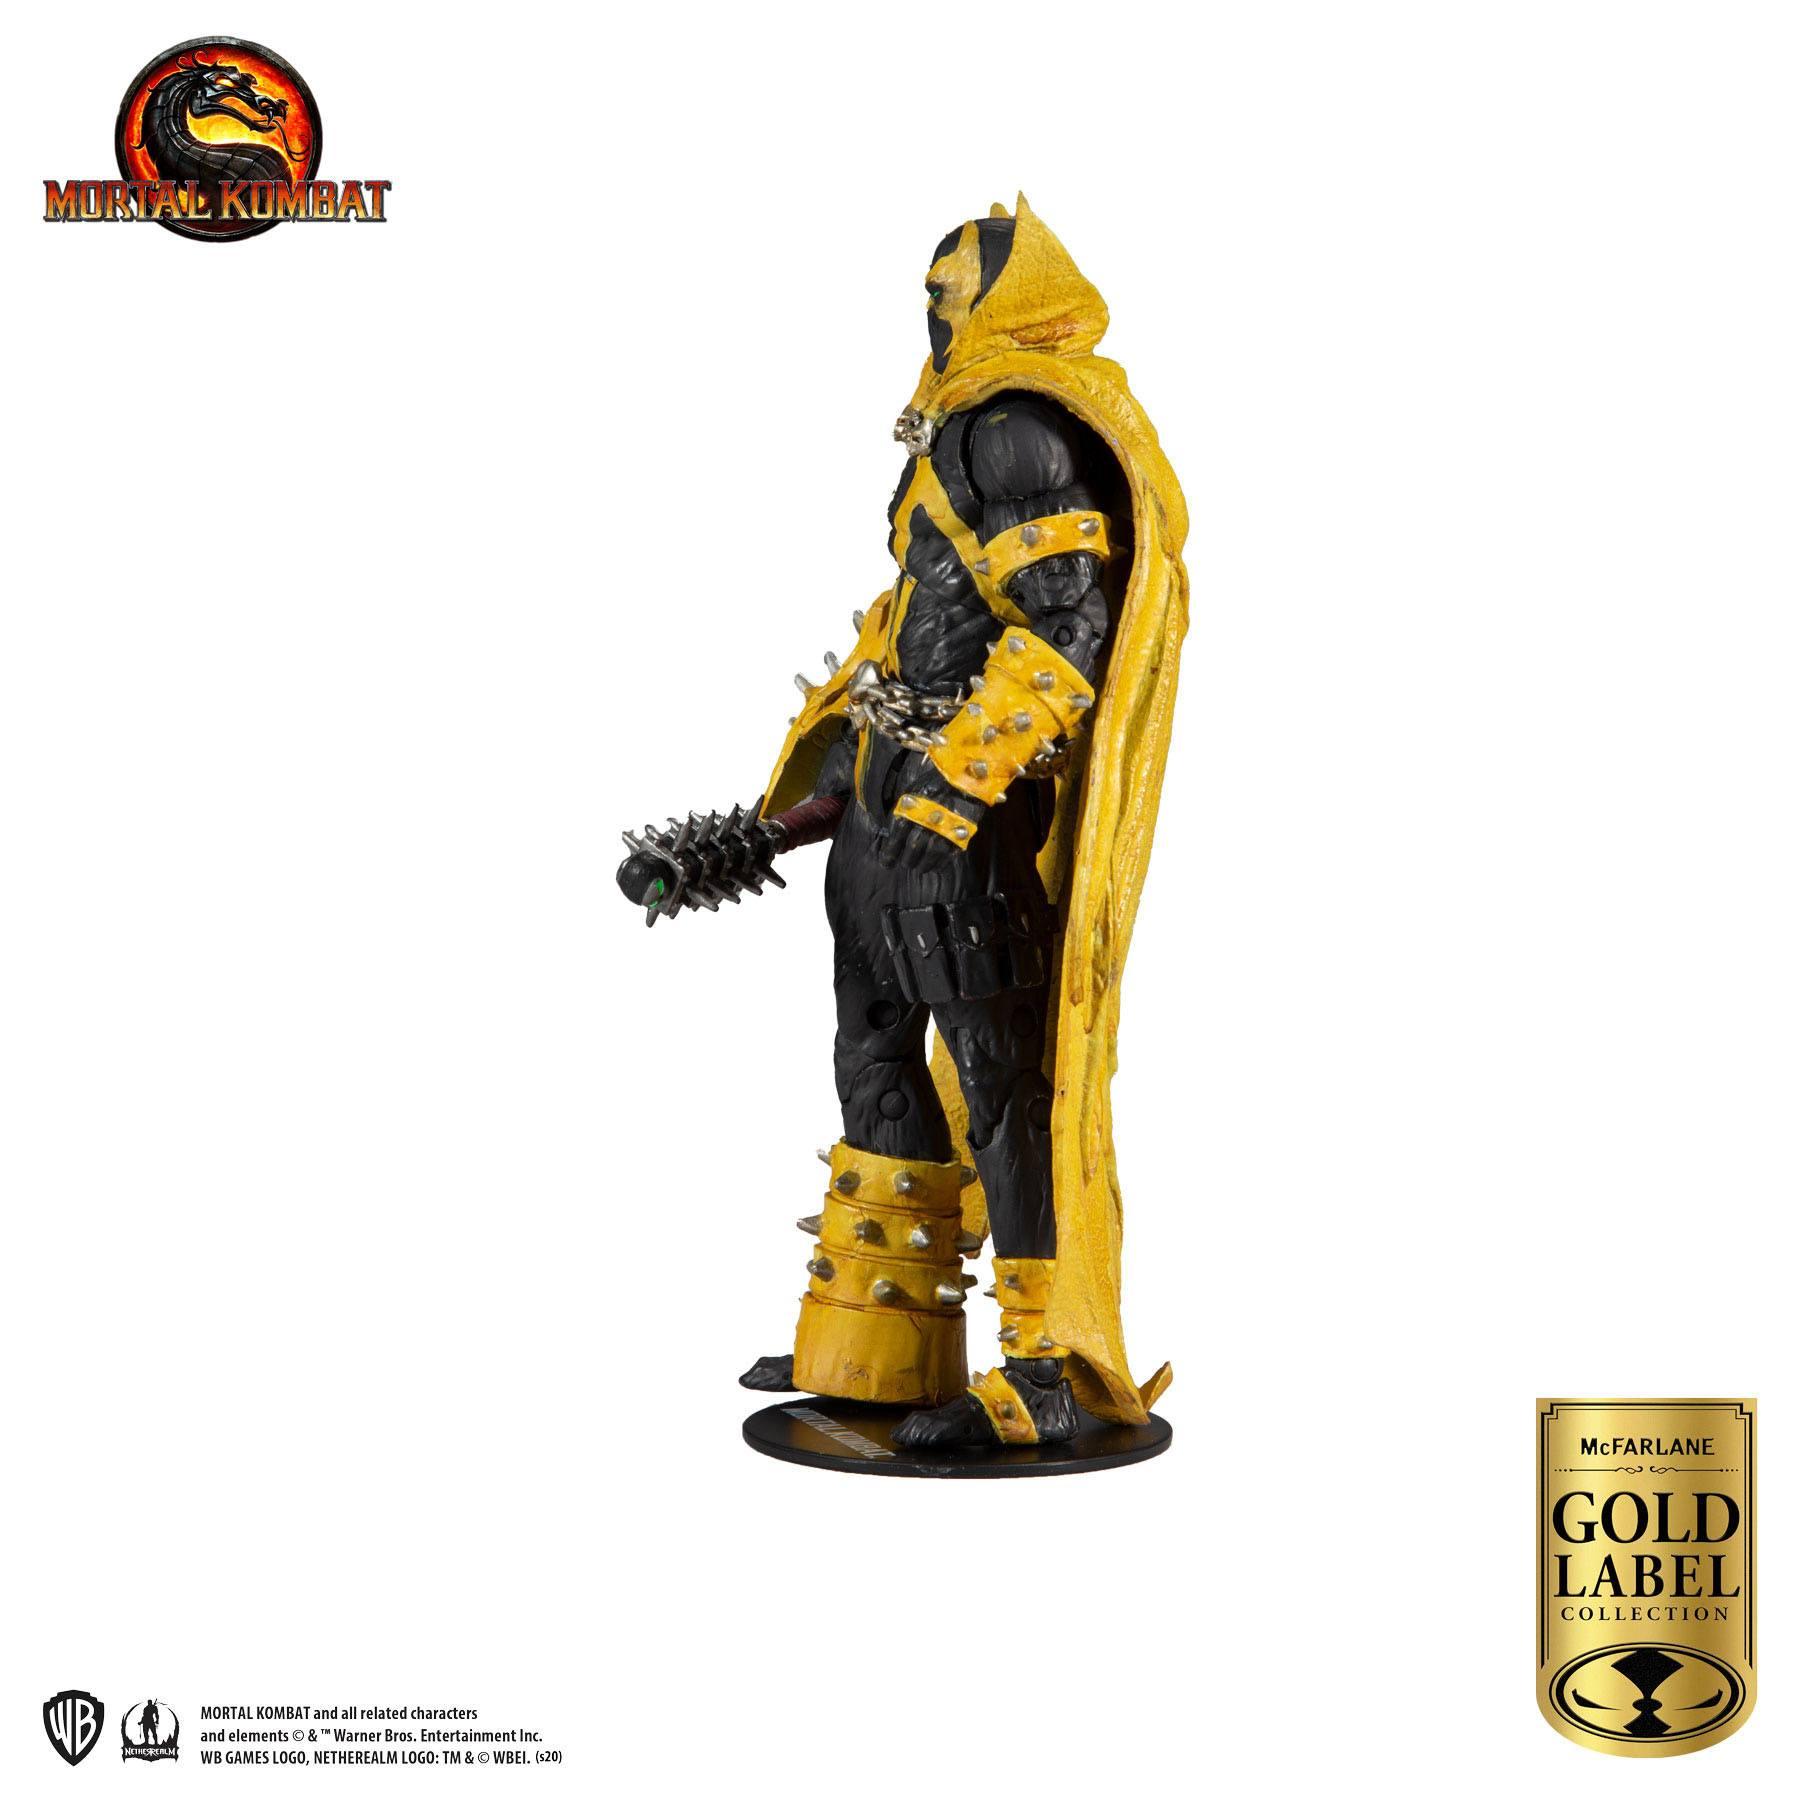 Mortal Kombat Actionfigur Spawn (Curse of Apocalypse) (Gold Label Series) 18 cm MCF11026-5 787926110265